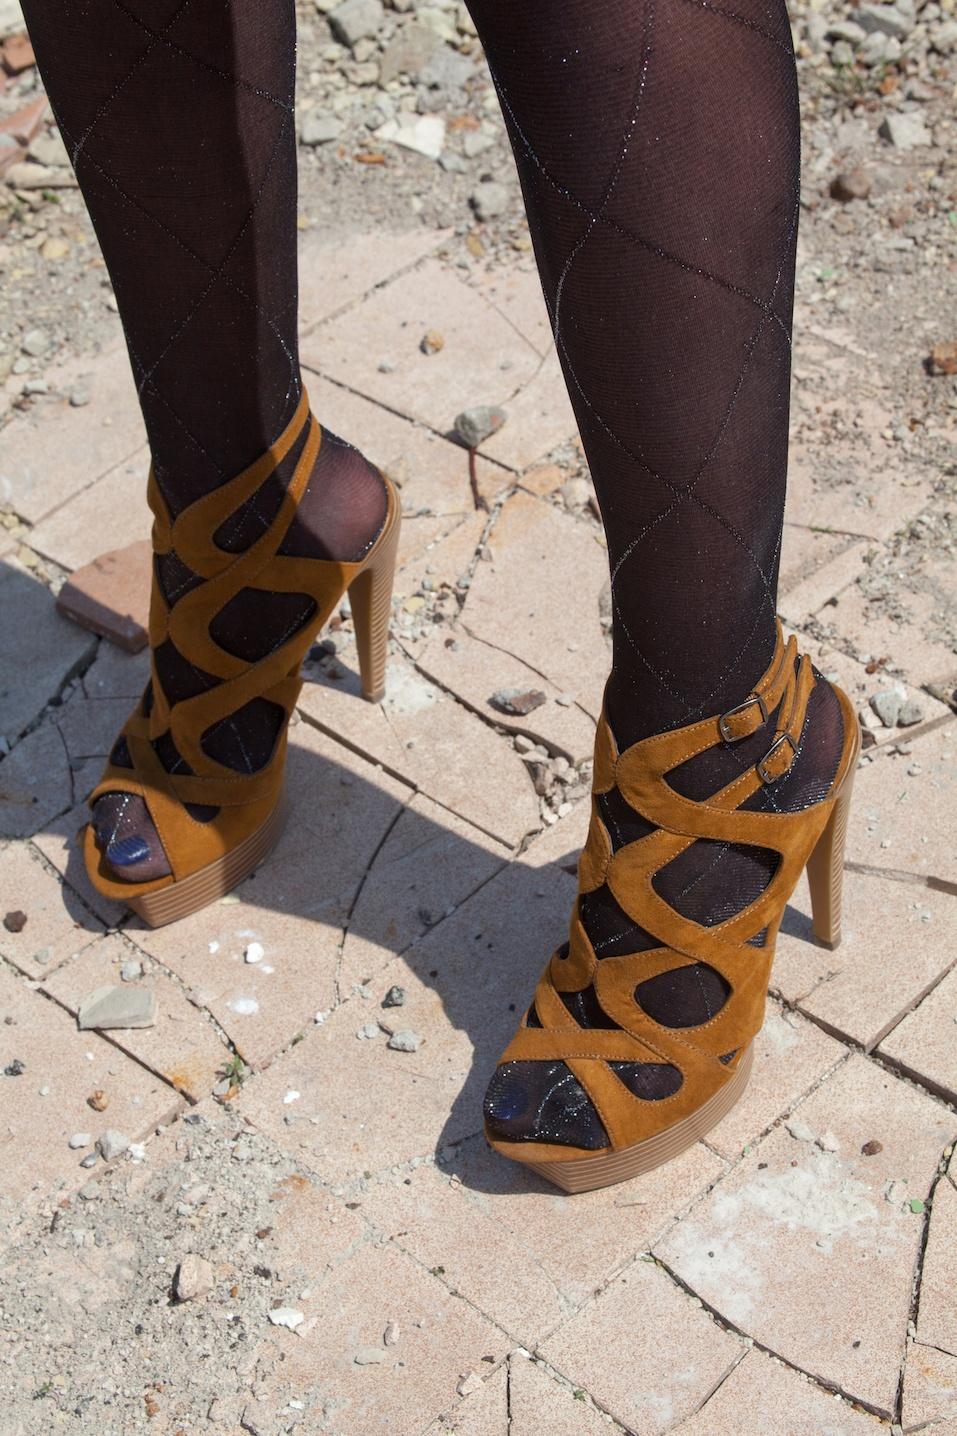 Woman's feet in high heel sandals